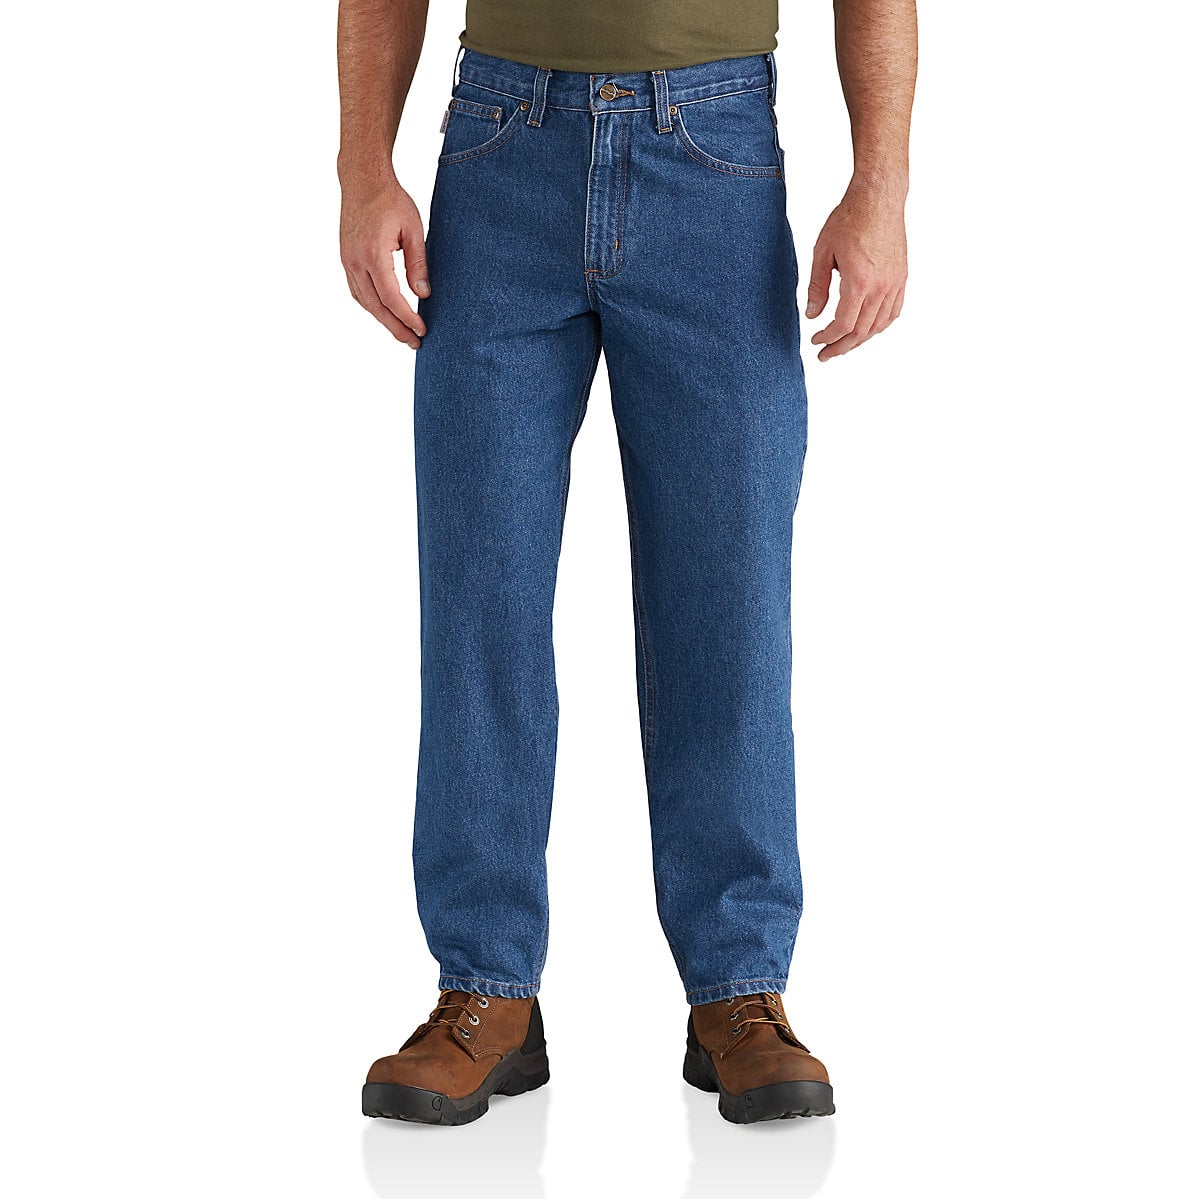 bca72c9ac3d Men's Relaxed Fit Tapered Leg Jean B17 | Carhartt